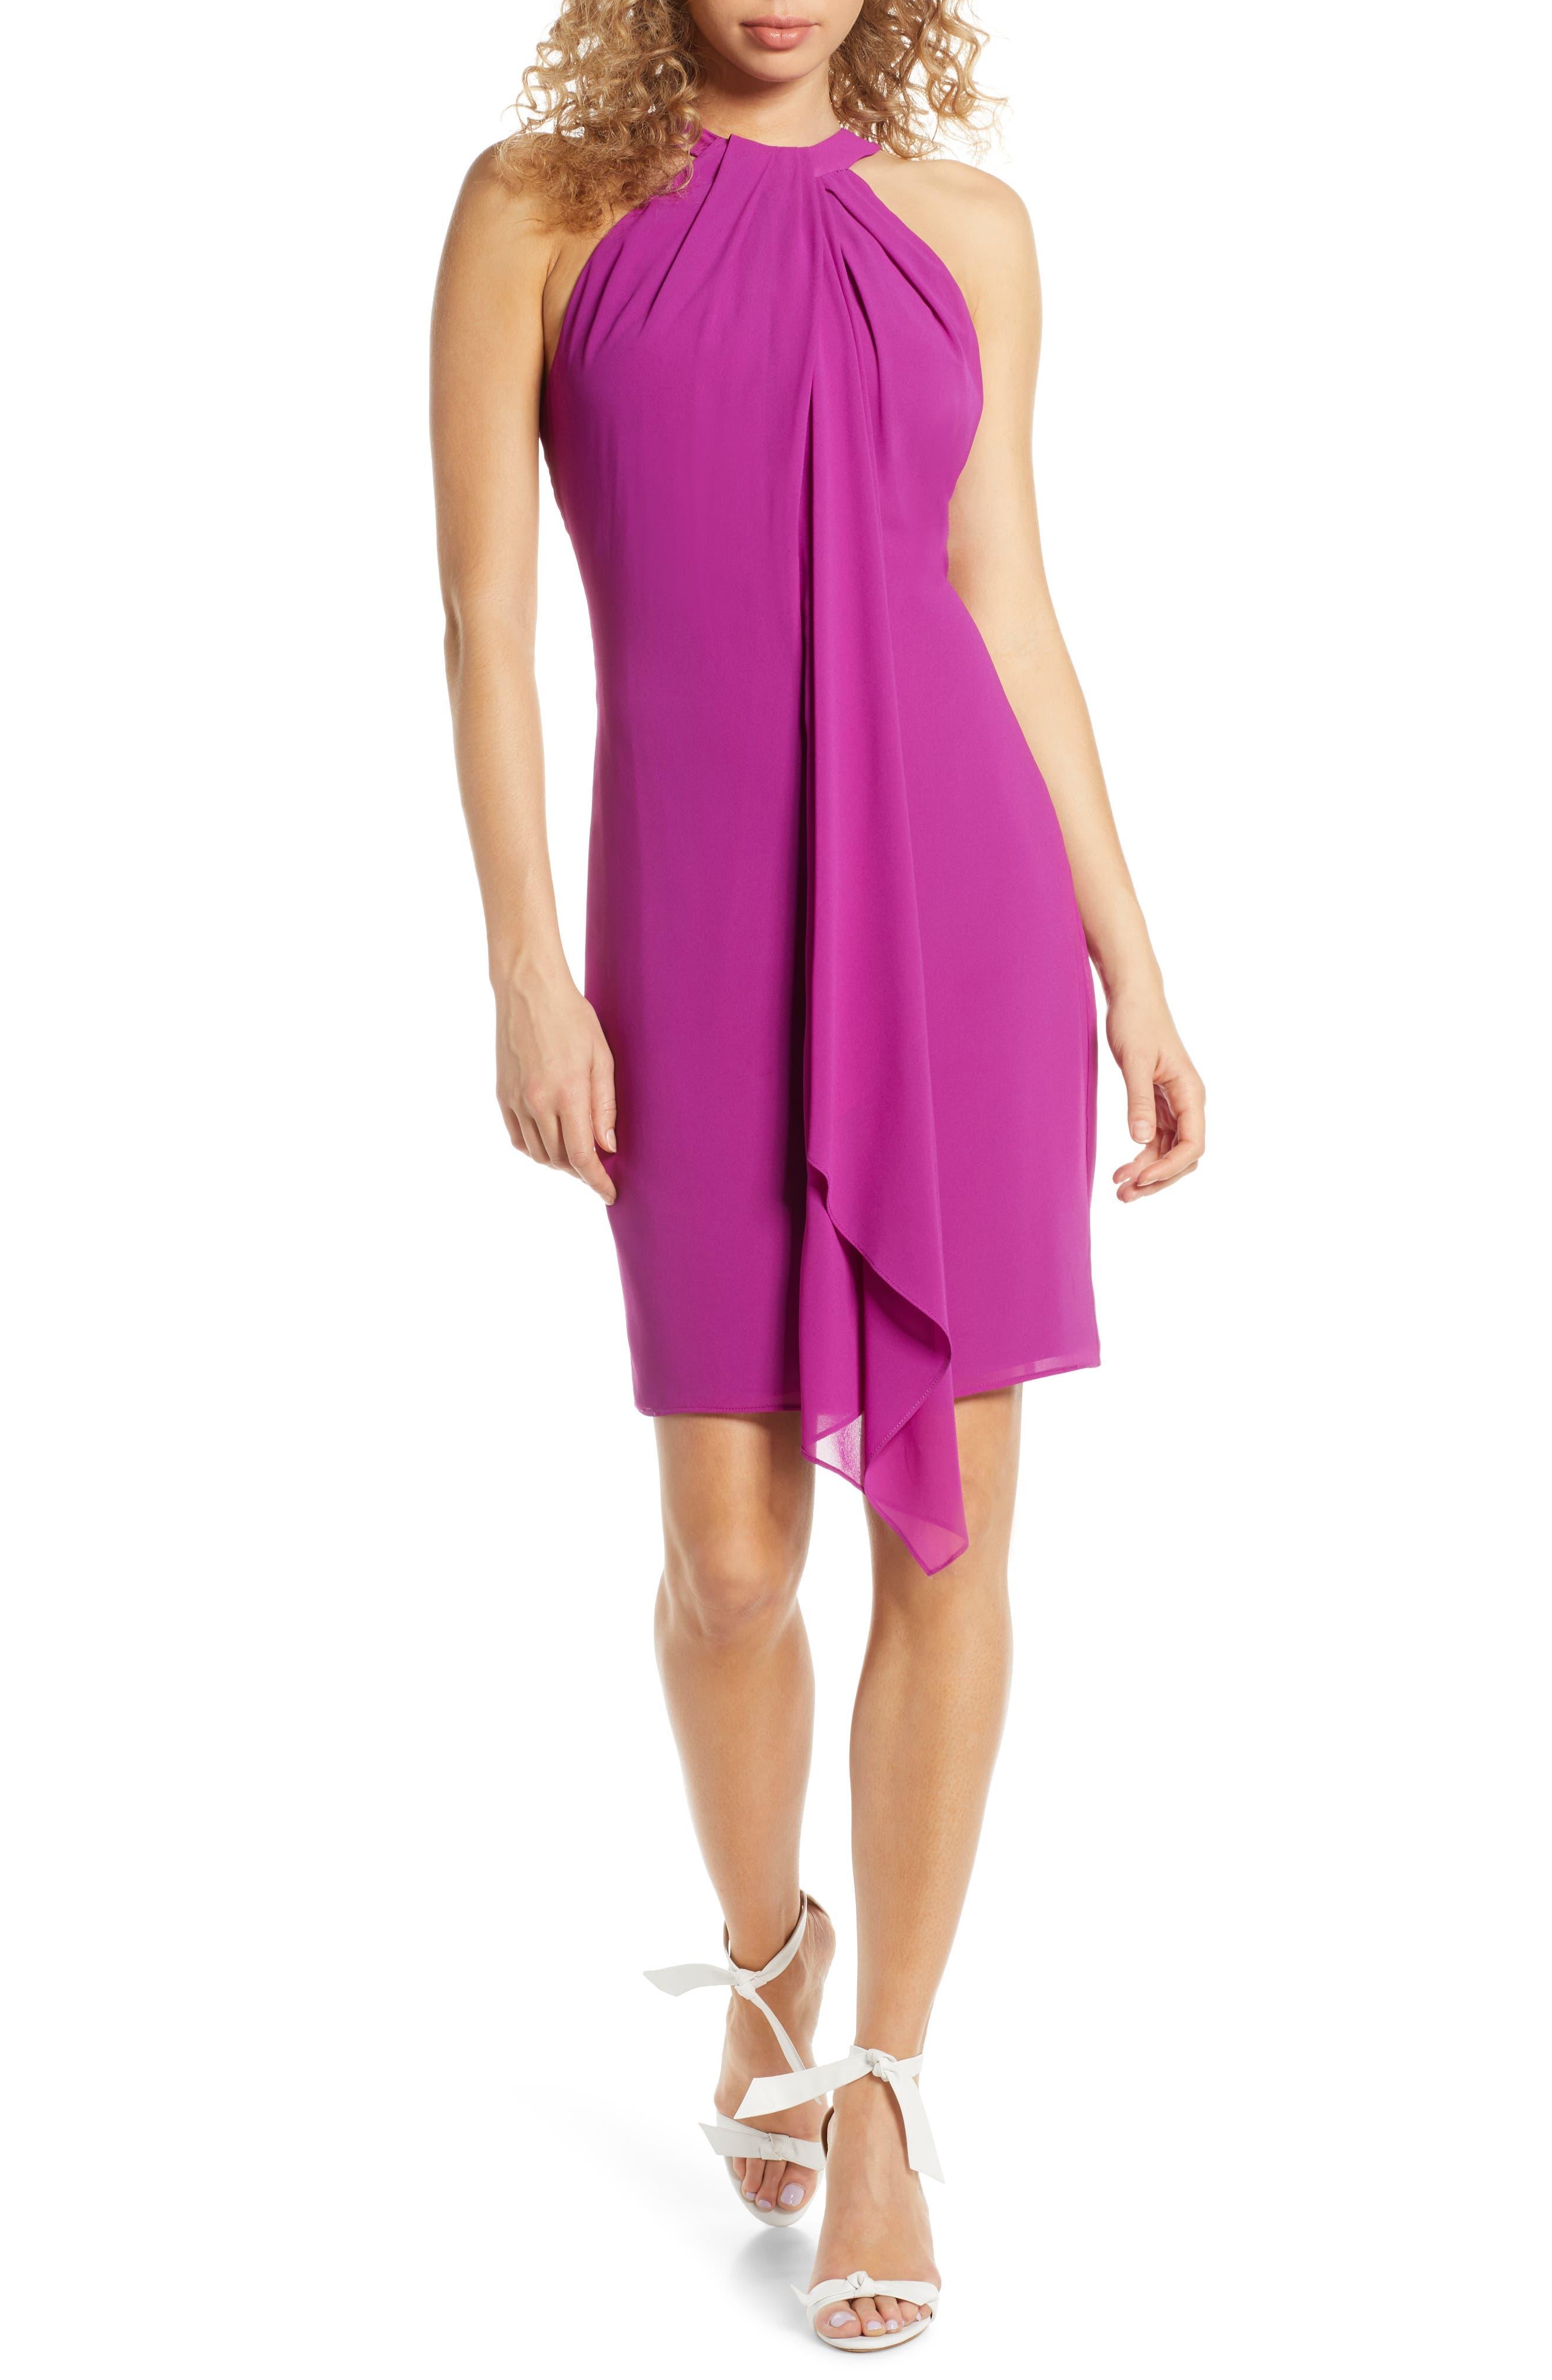 Mark + James By Badgley Mischka Drape Neck Halter Dress, Purple